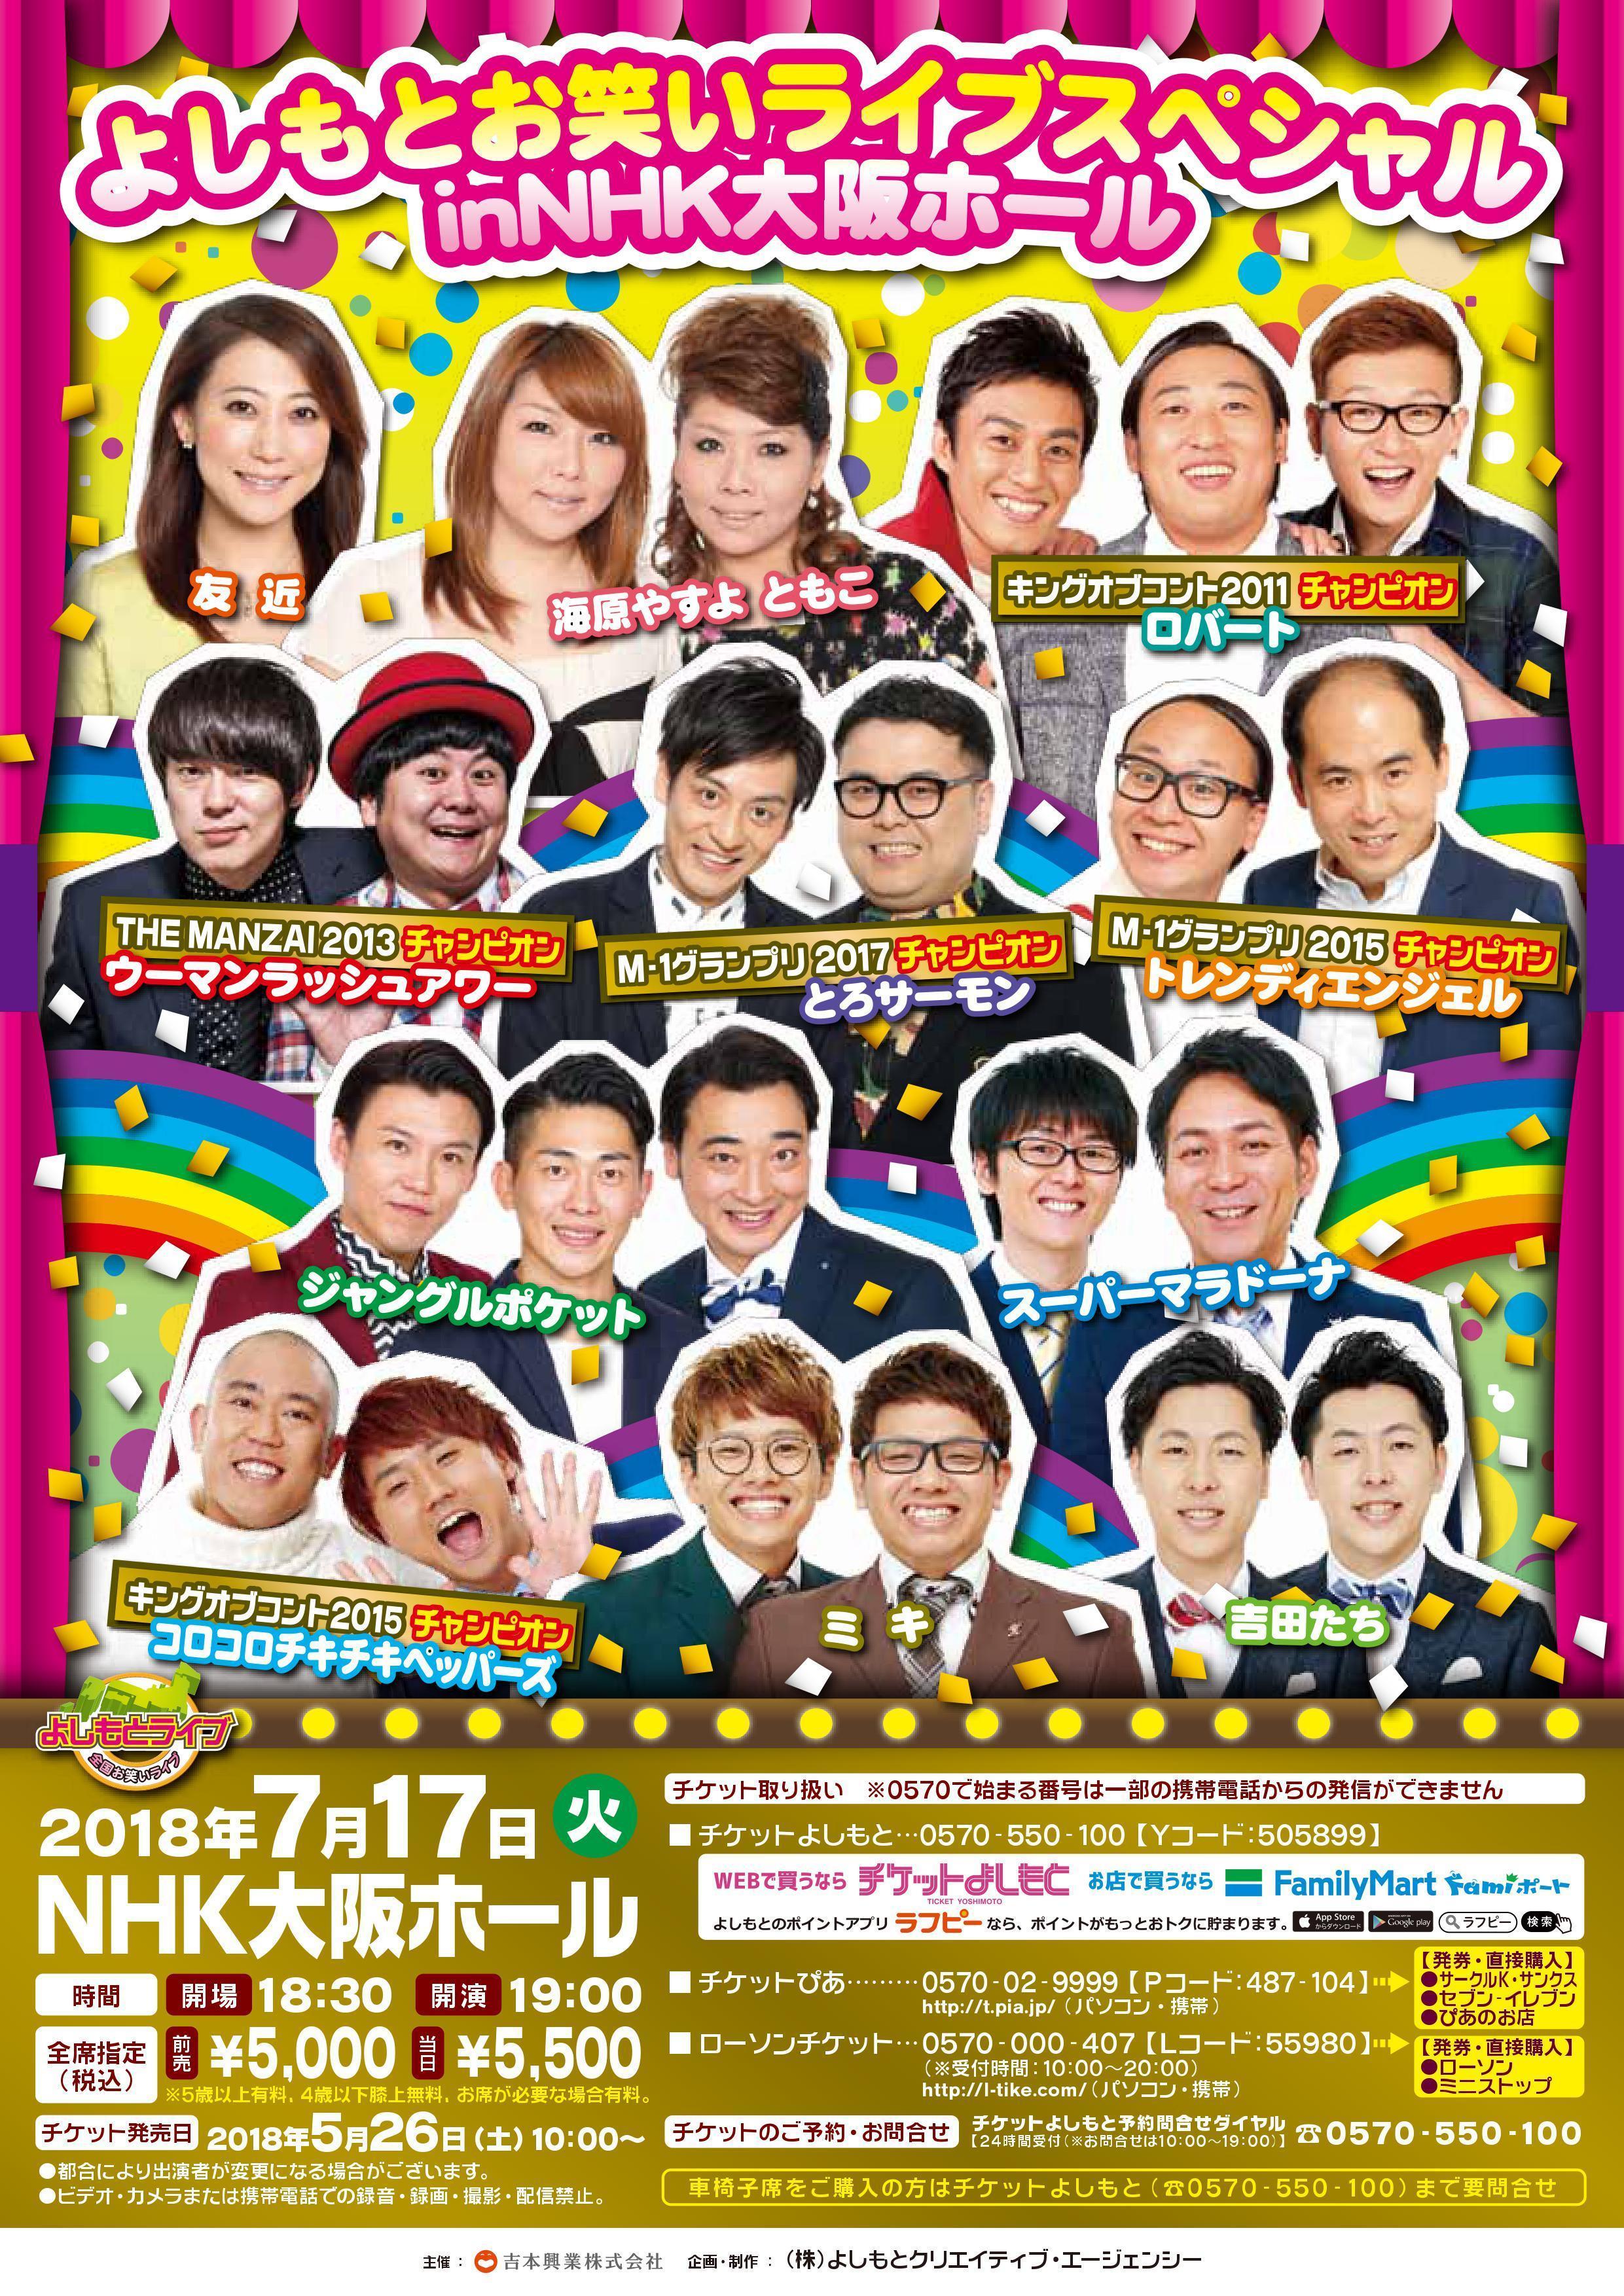 http://news.yoshimoto.co.jp/20180612193015-46e5b1e8d615e571c752869a67183bf0064990ac.jpg